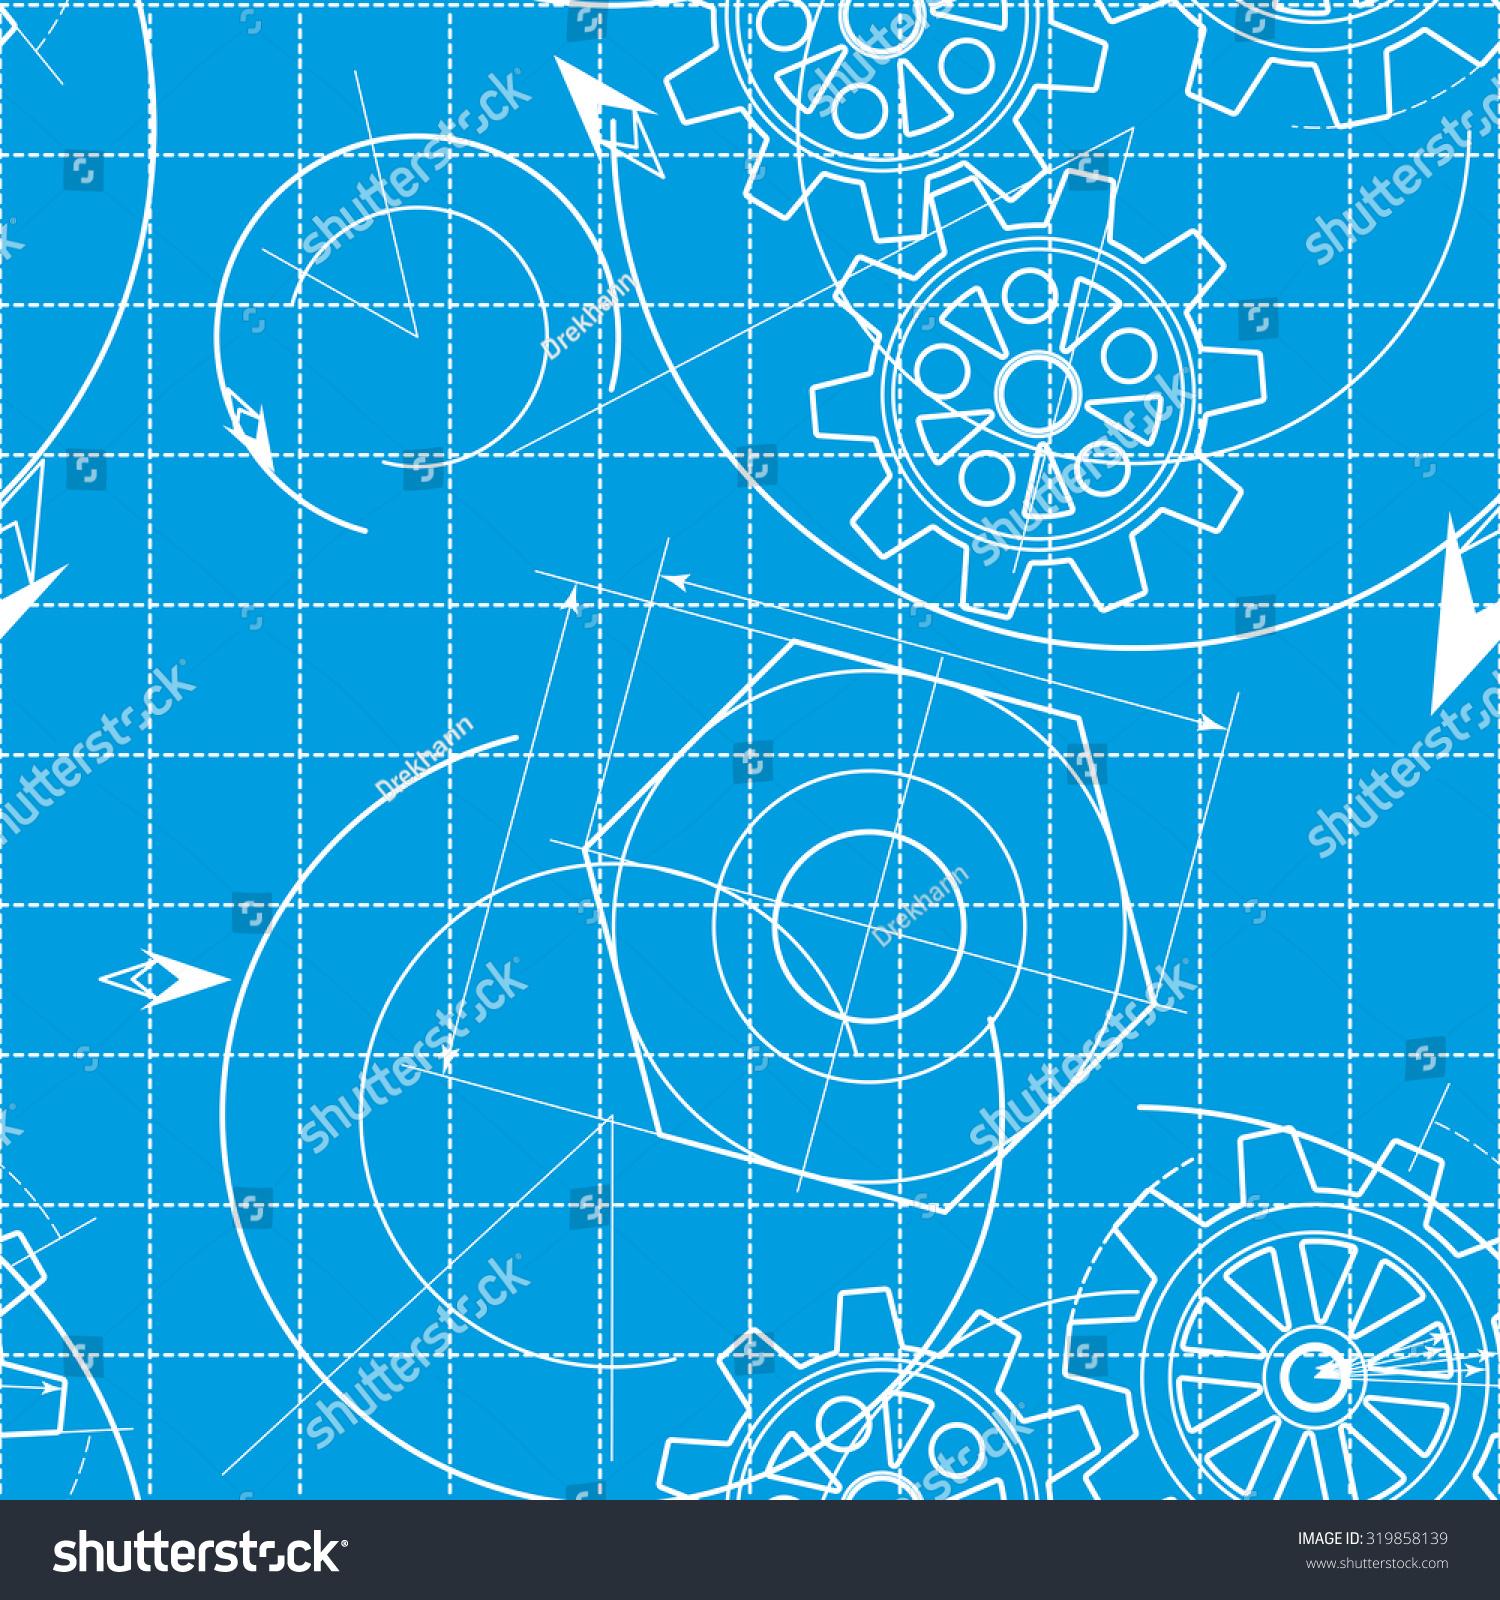 Blueprint pattern gears stock illustration 319858139 shutterstock blueprint pattern with gears malvernweather Images